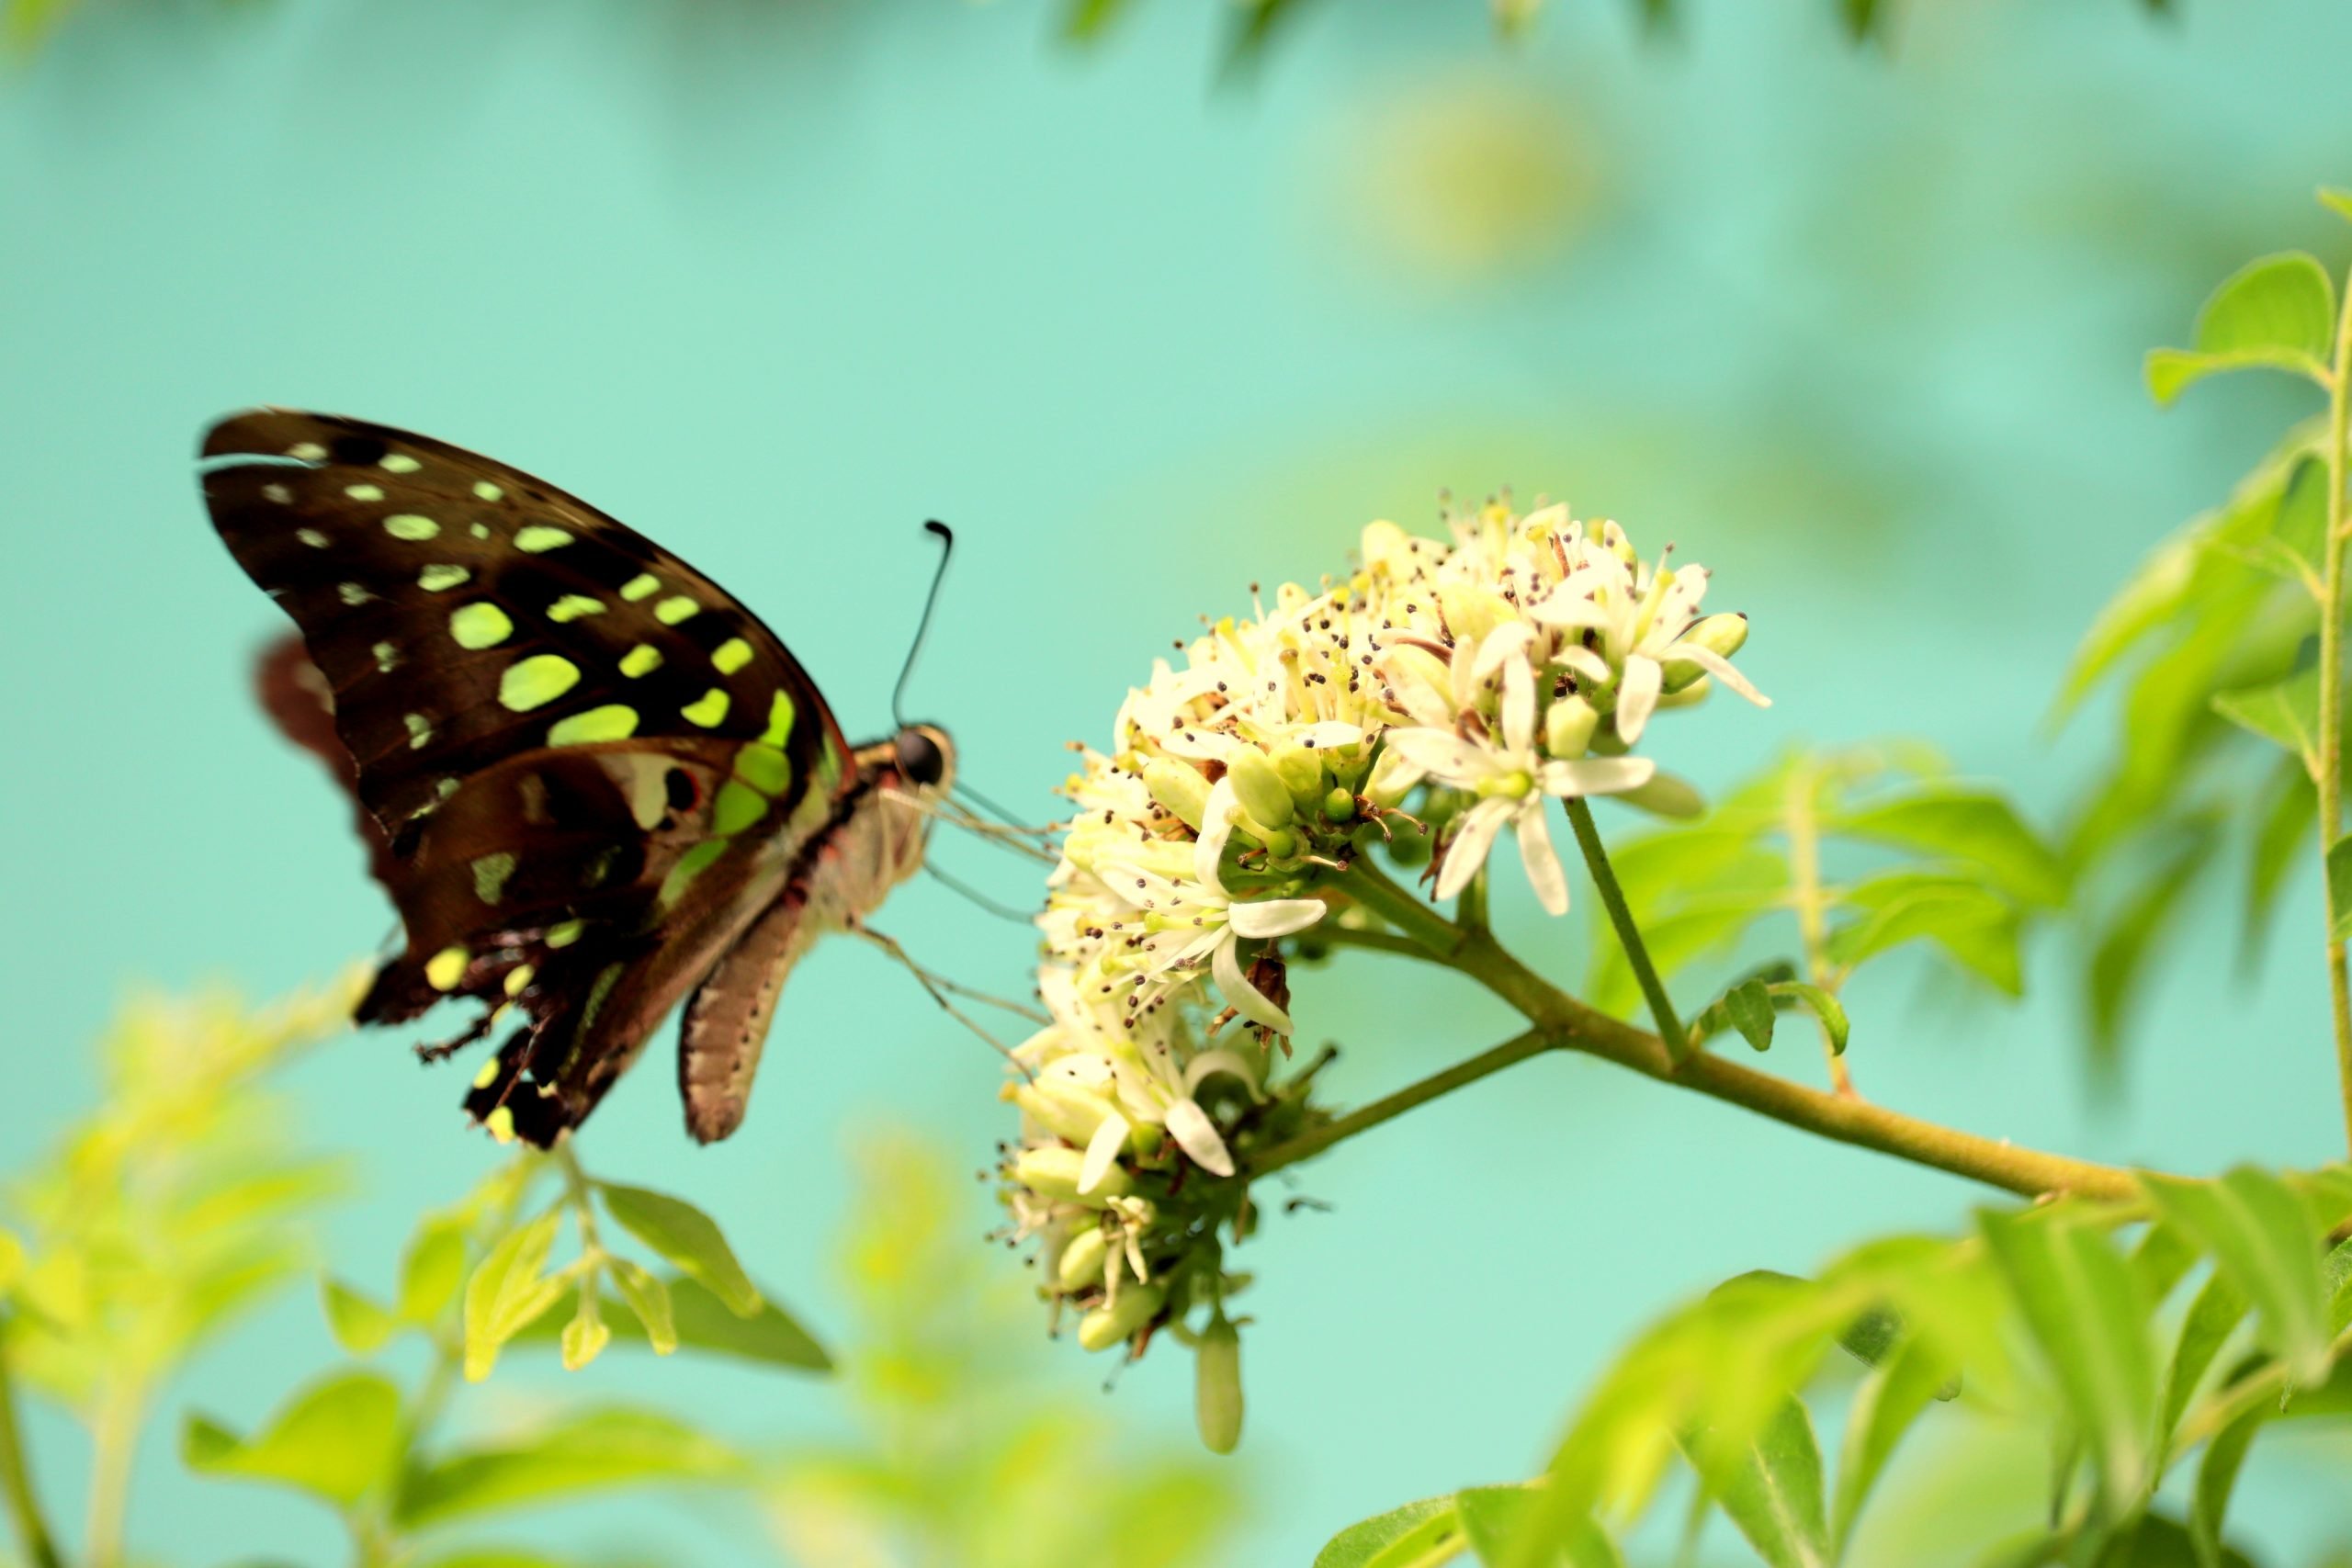 Butterfly sucking honey